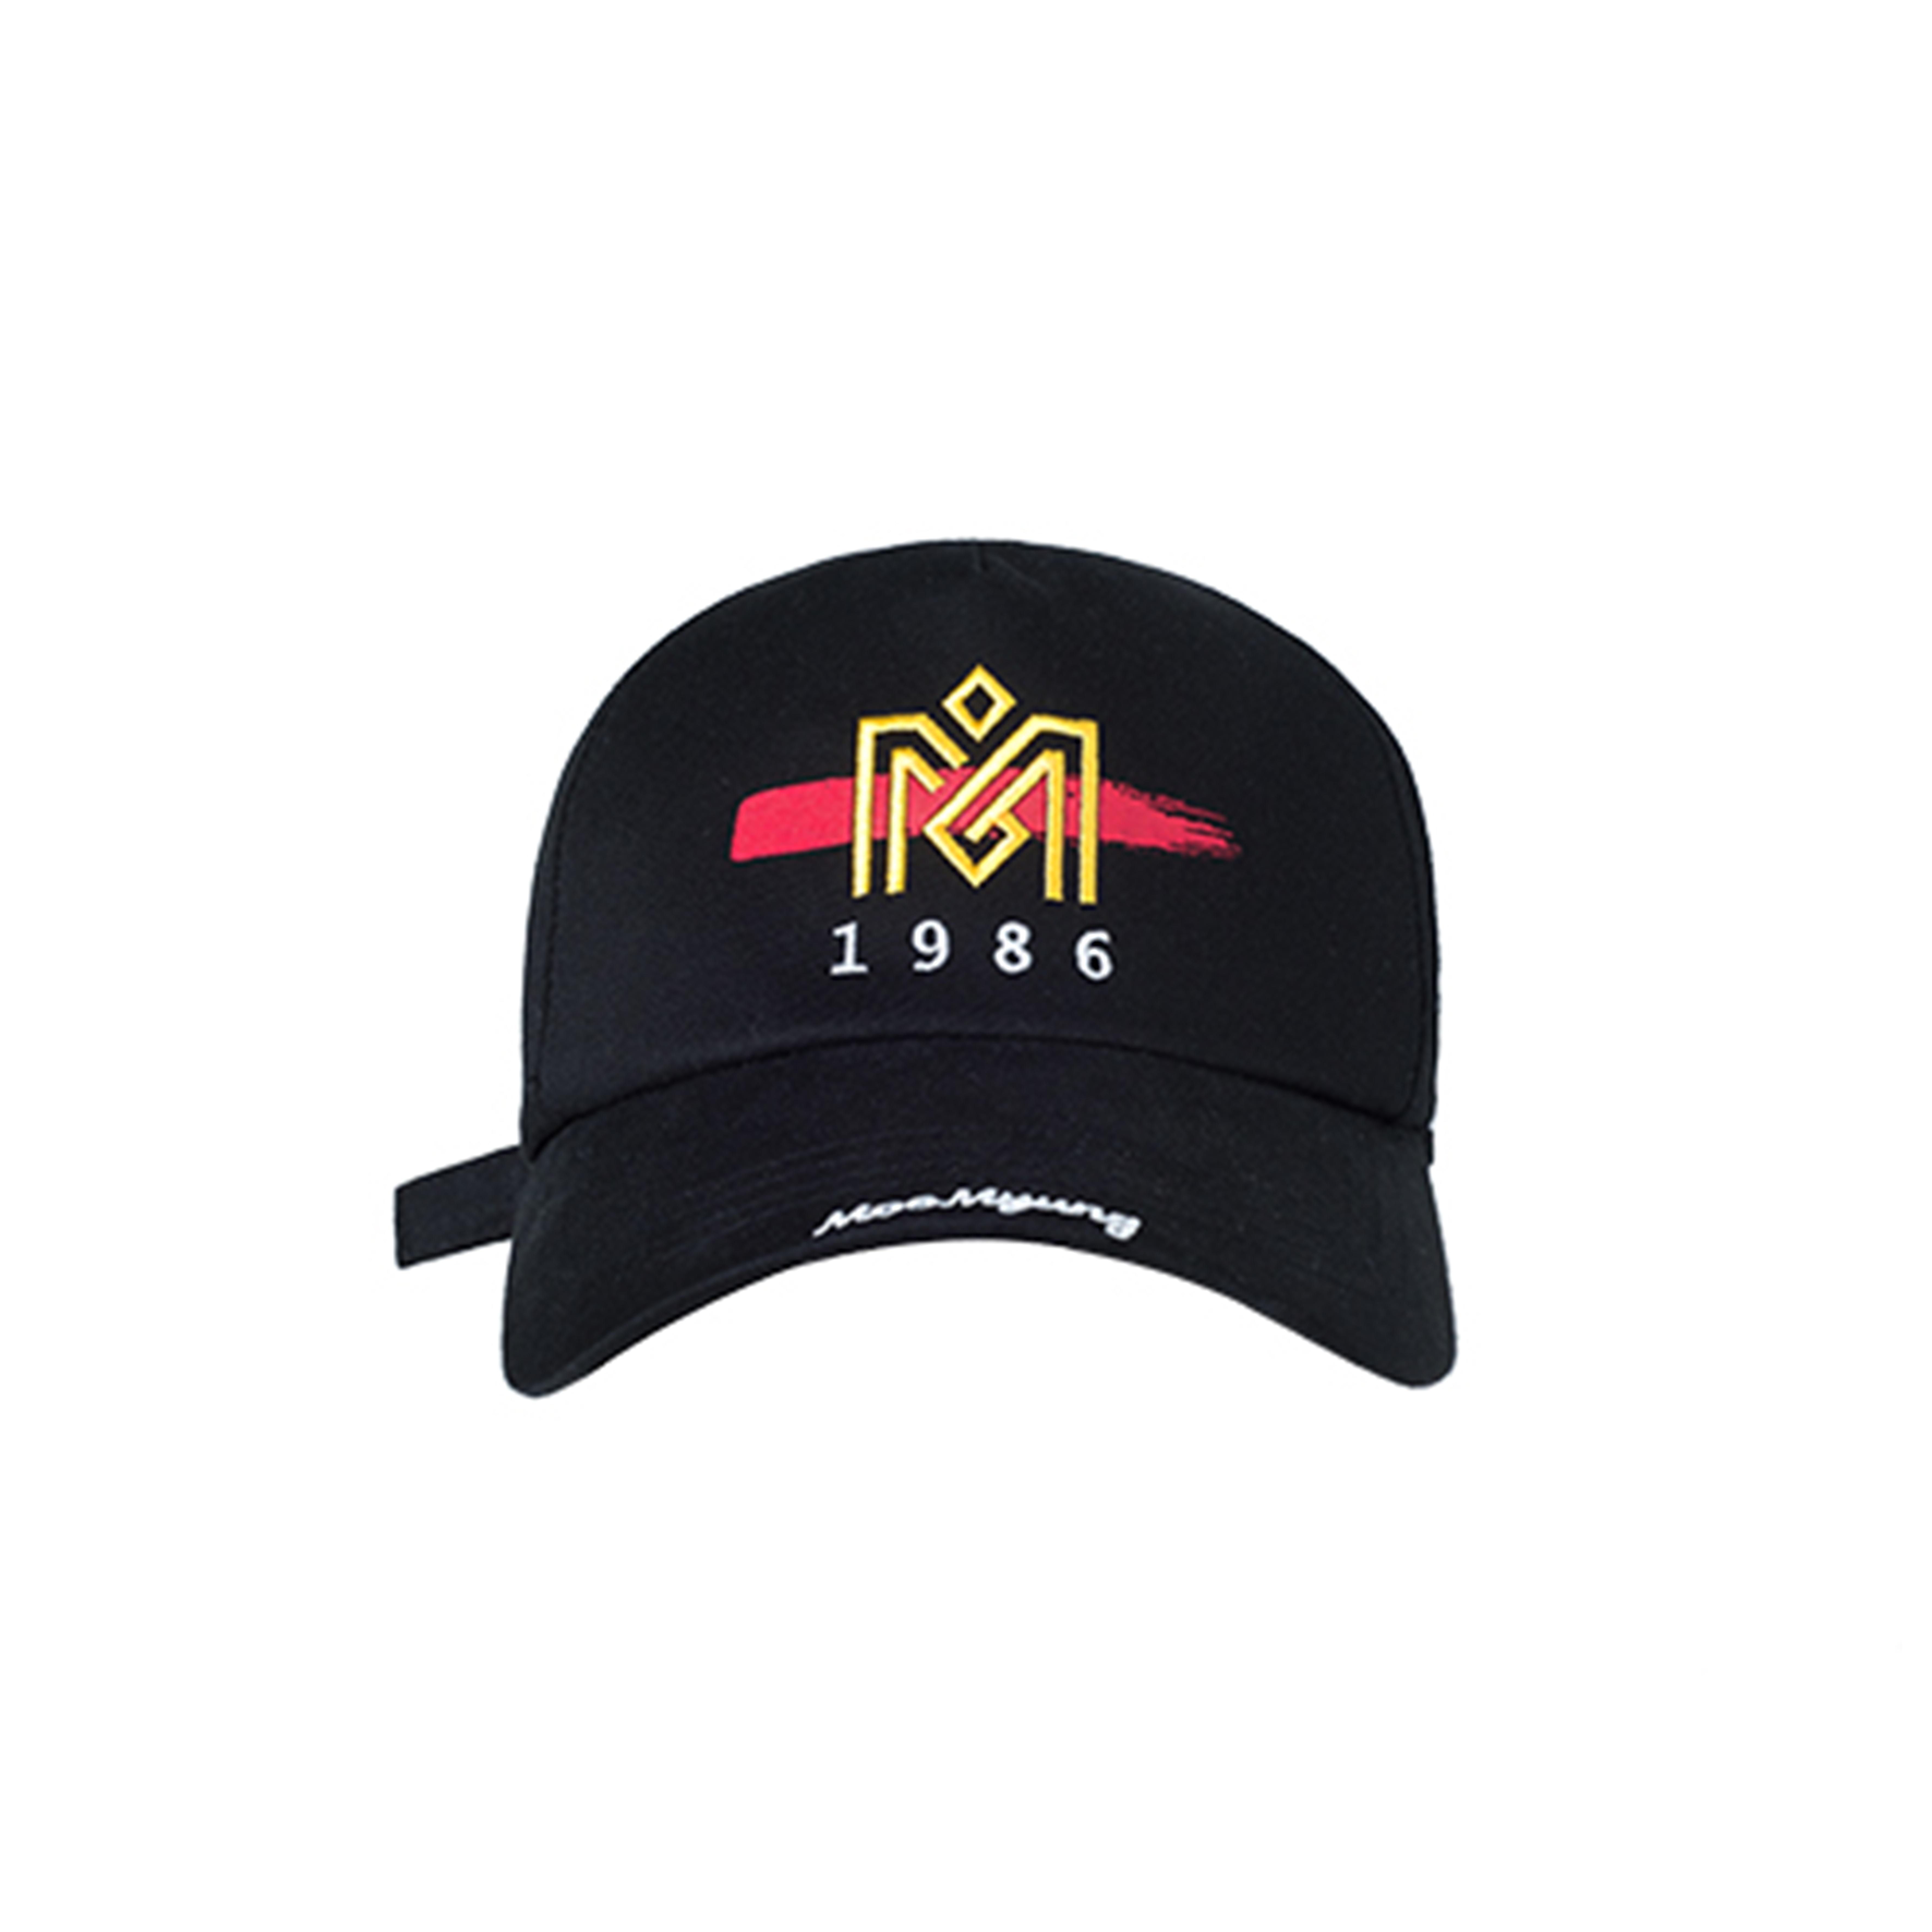 M.O.M.G BRUSH LOGO BALL CAP / BLACK